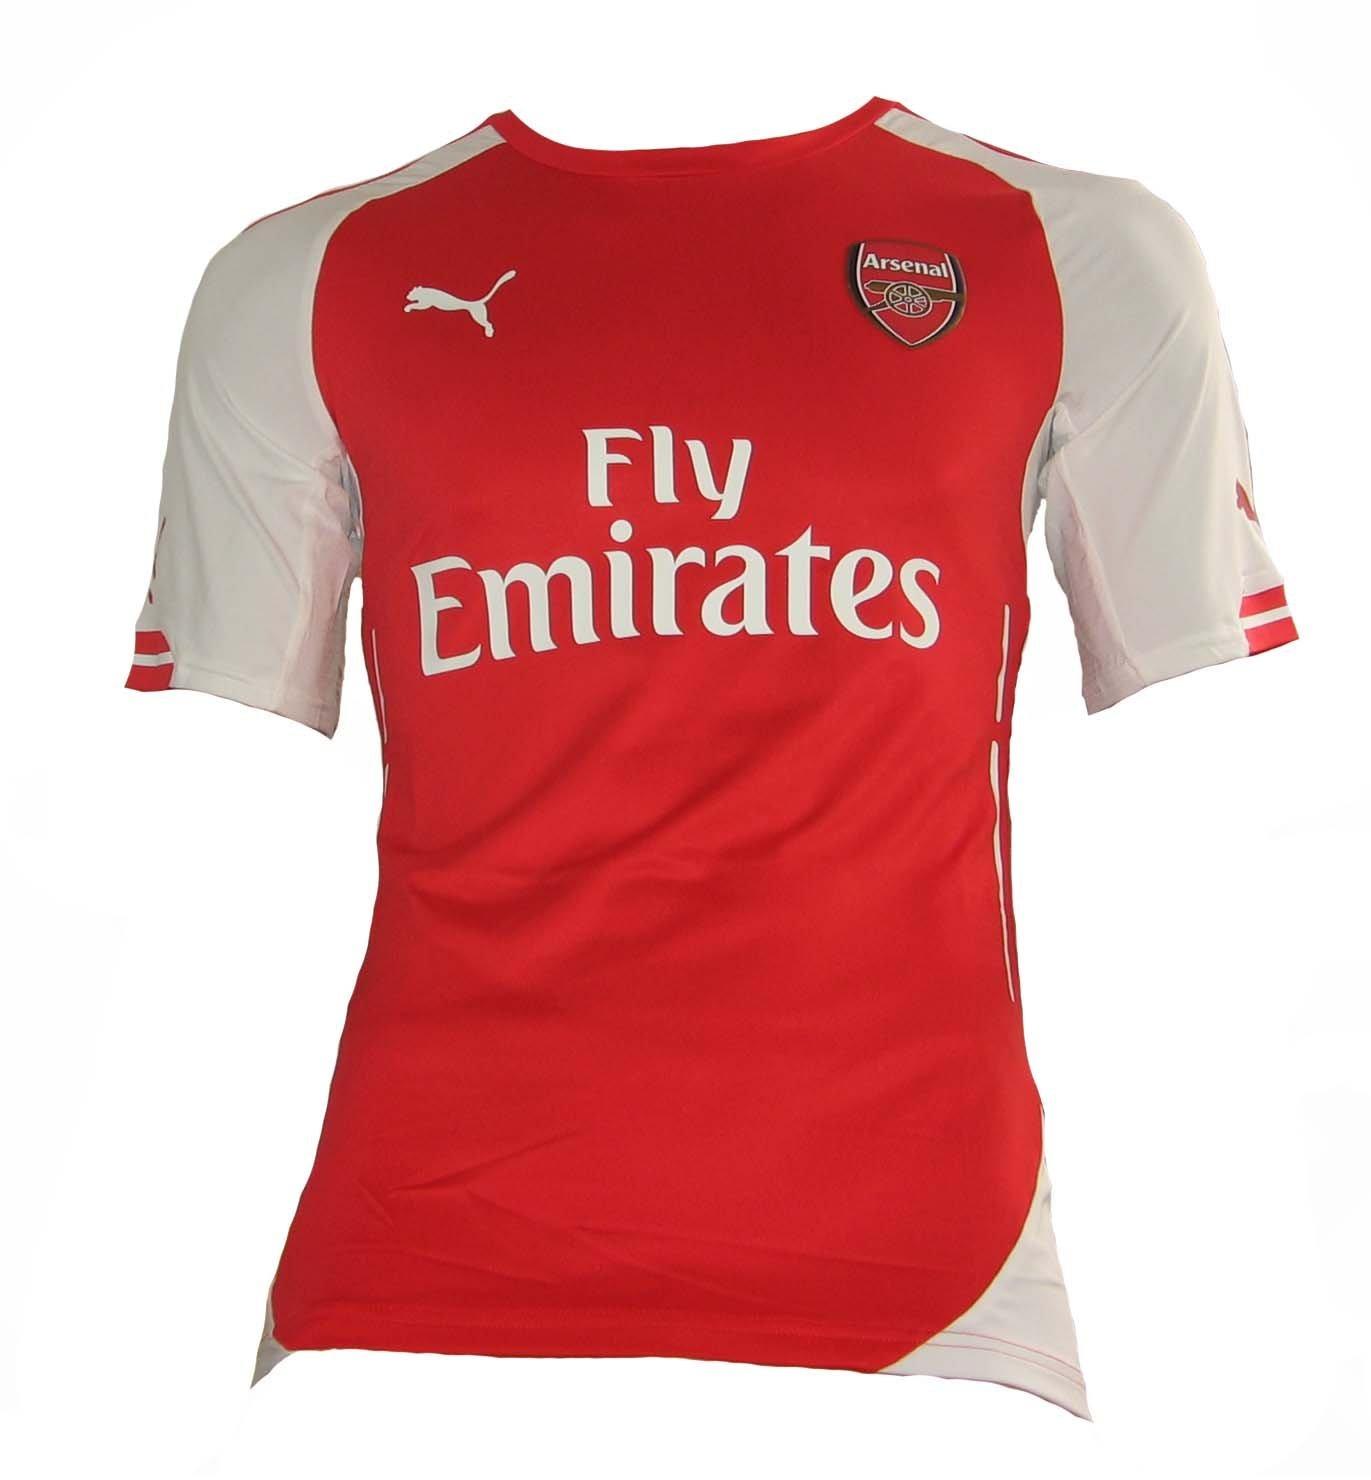 Puma Arsenal London Authentic Trikot Home 2014 15 Close Fitting Style